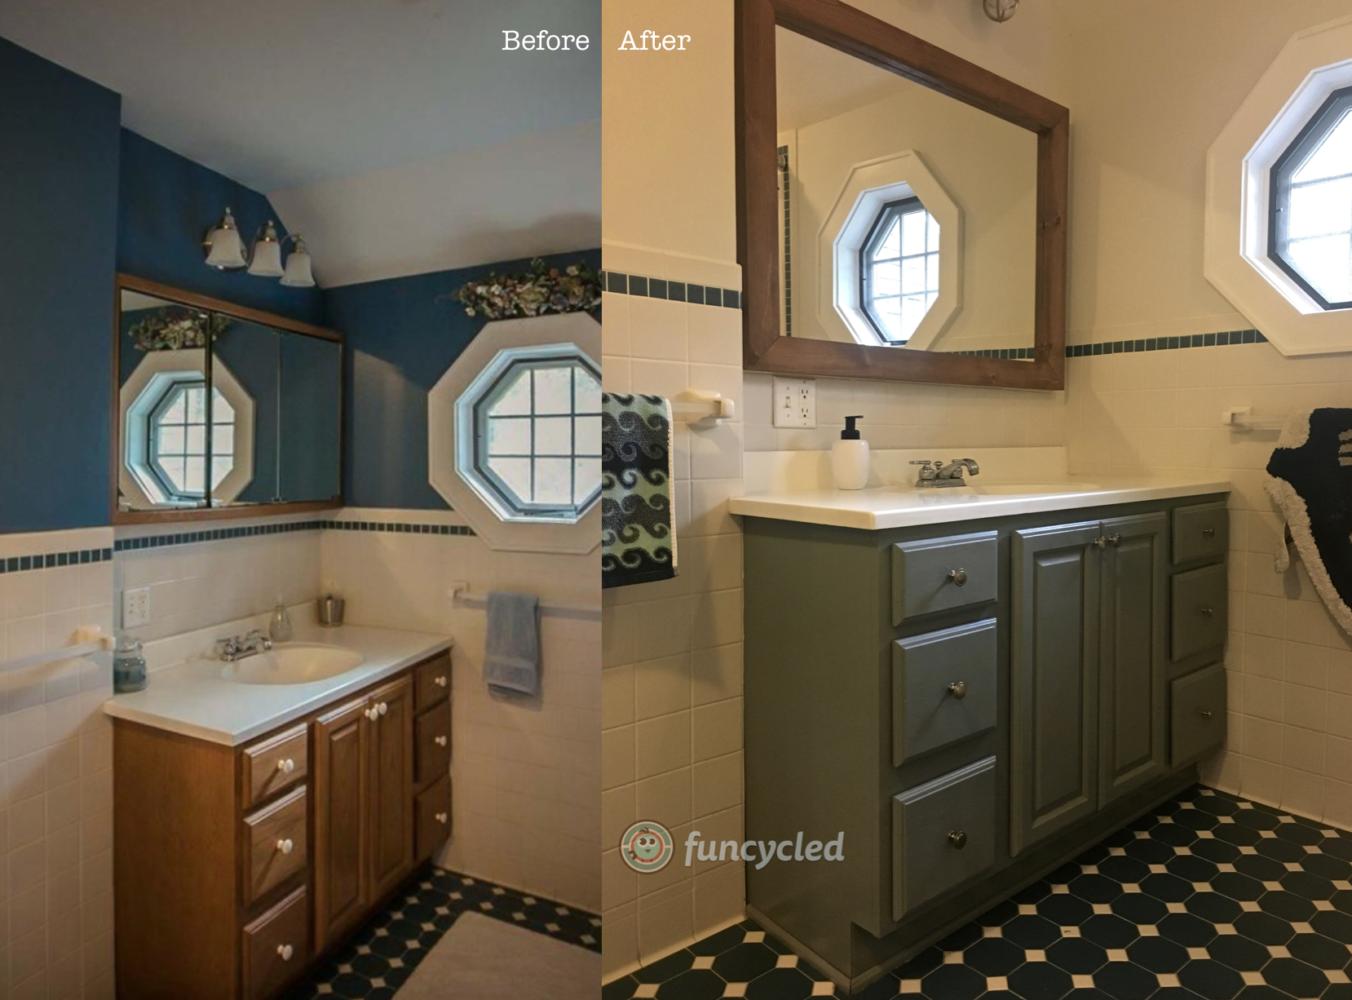 Brewster Gray Bathroom Vanity Makeover Funcycled